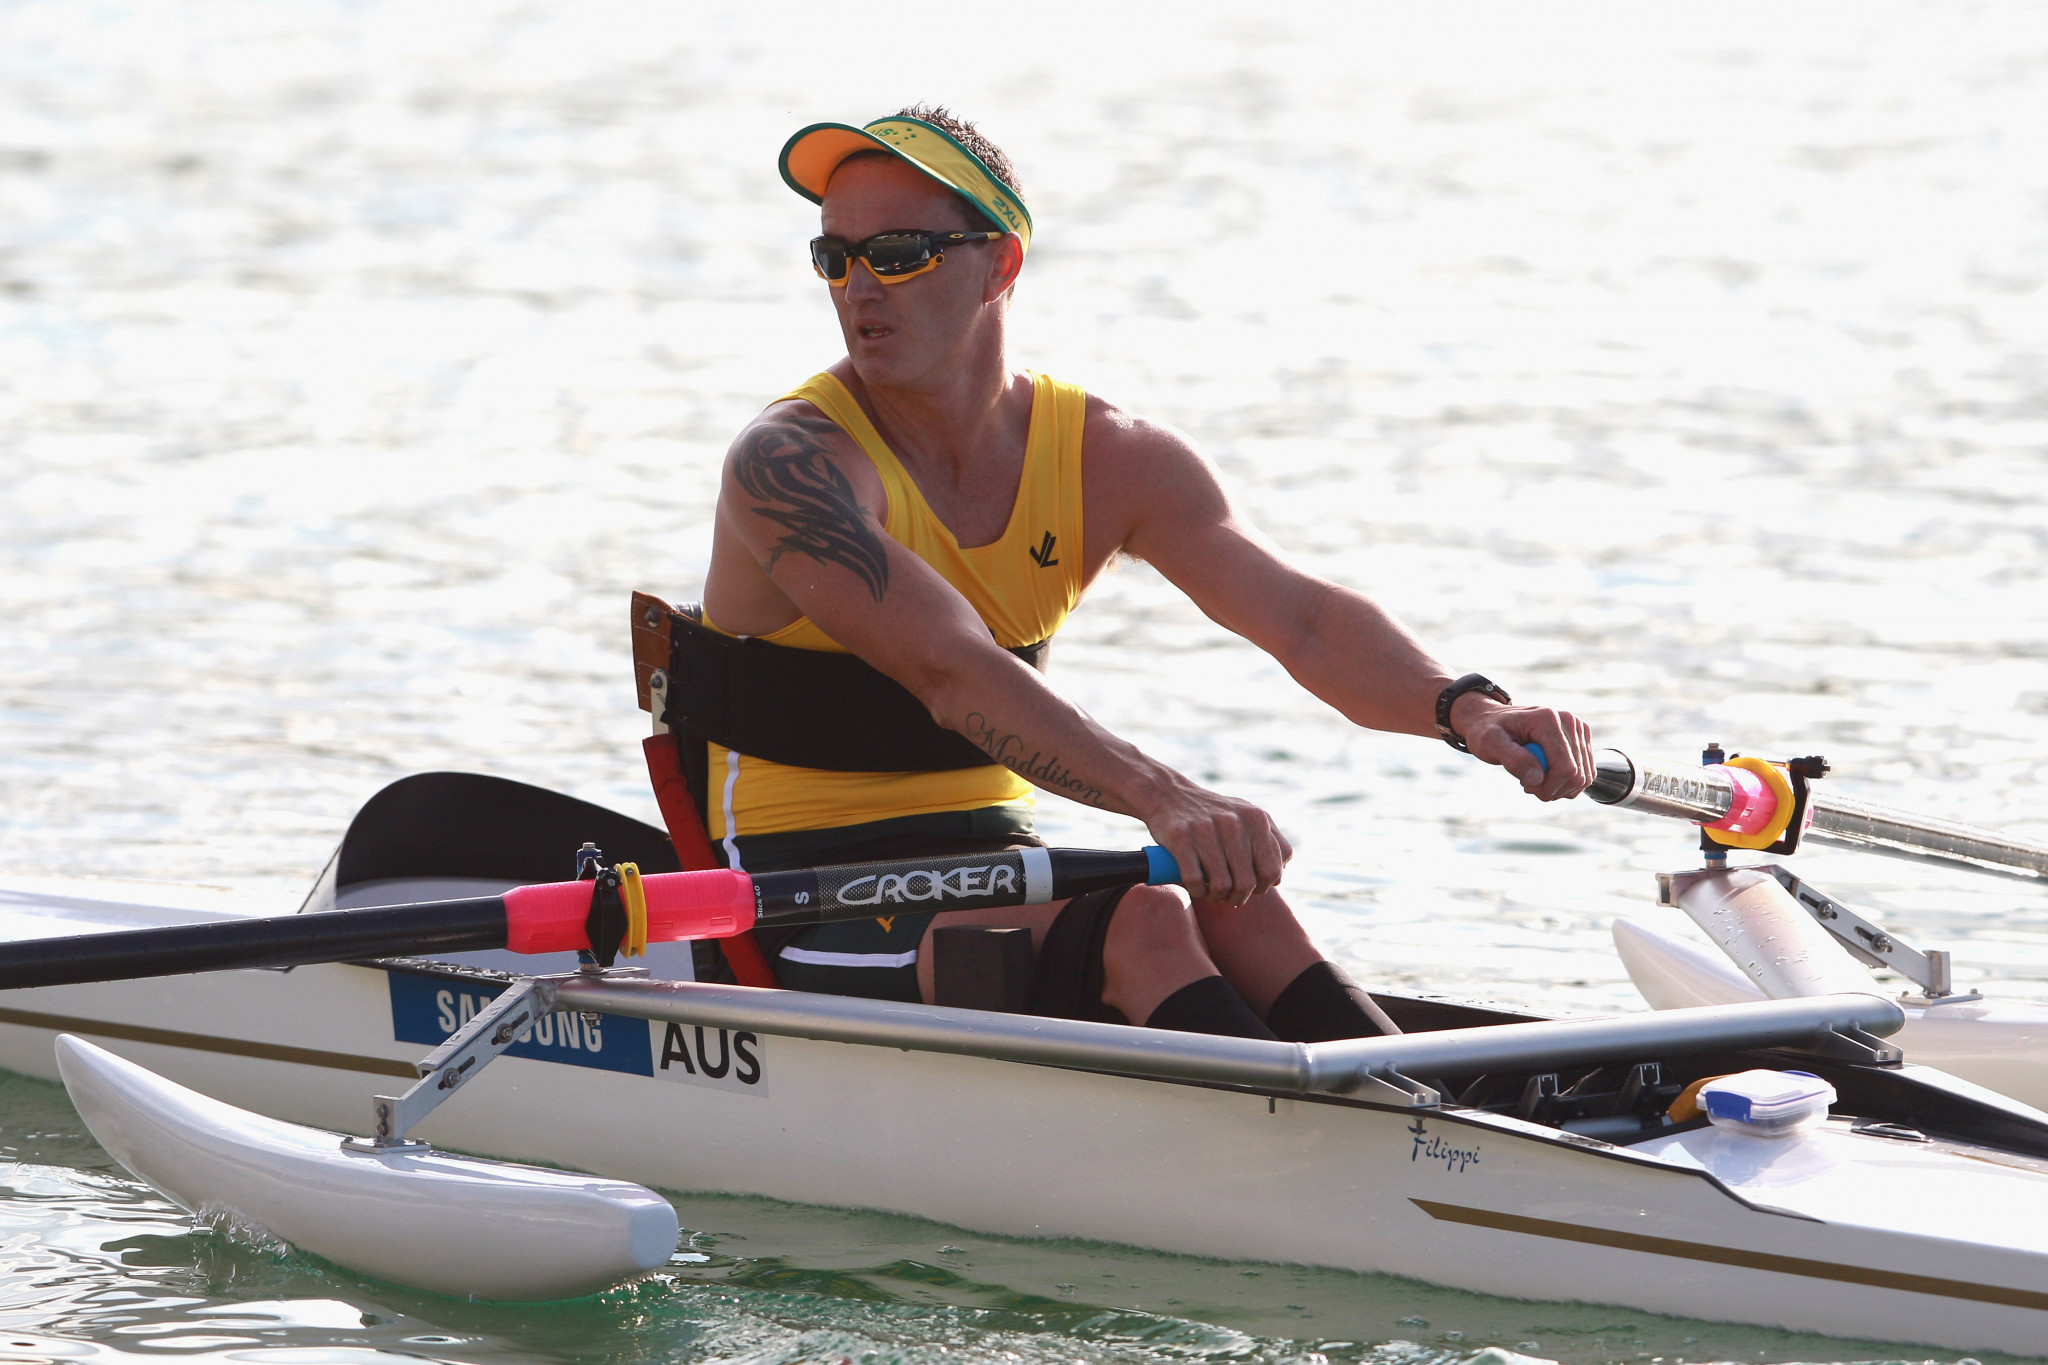 Rivalries to resume at Para Rowing International Regatta in Gavirate